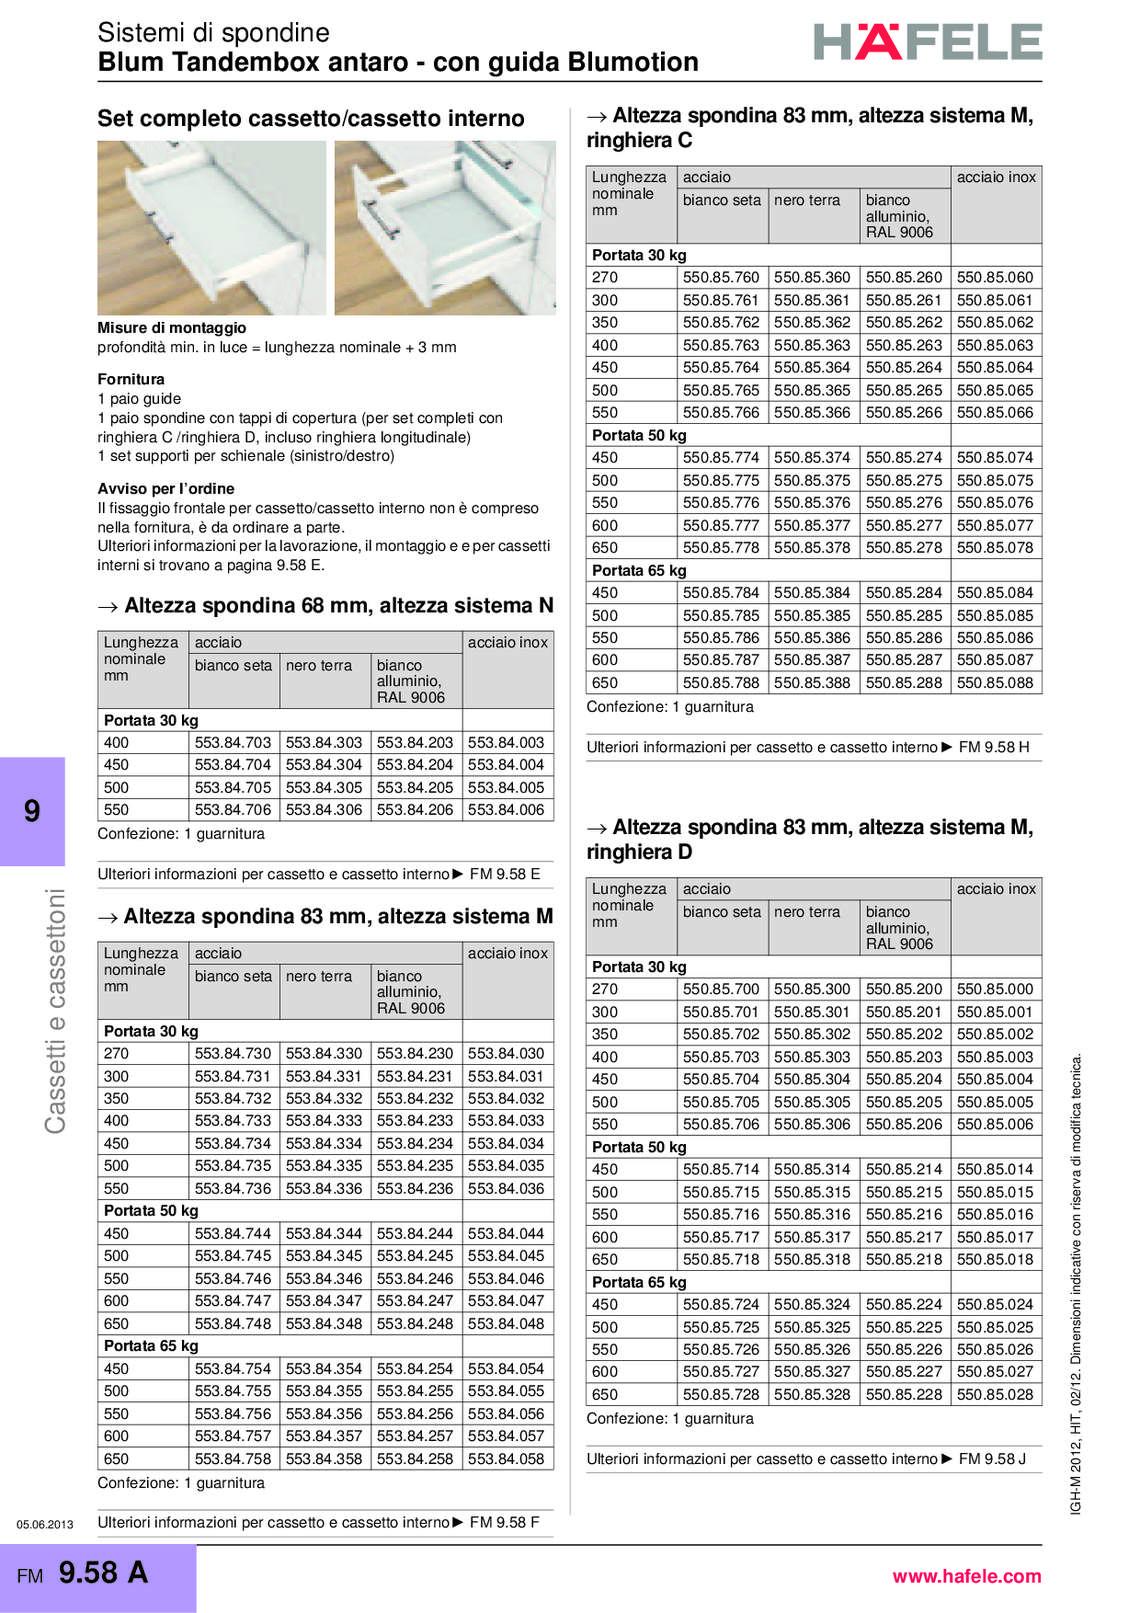 hafele-spondine-e-guide-per-mobili_40_075.jpg